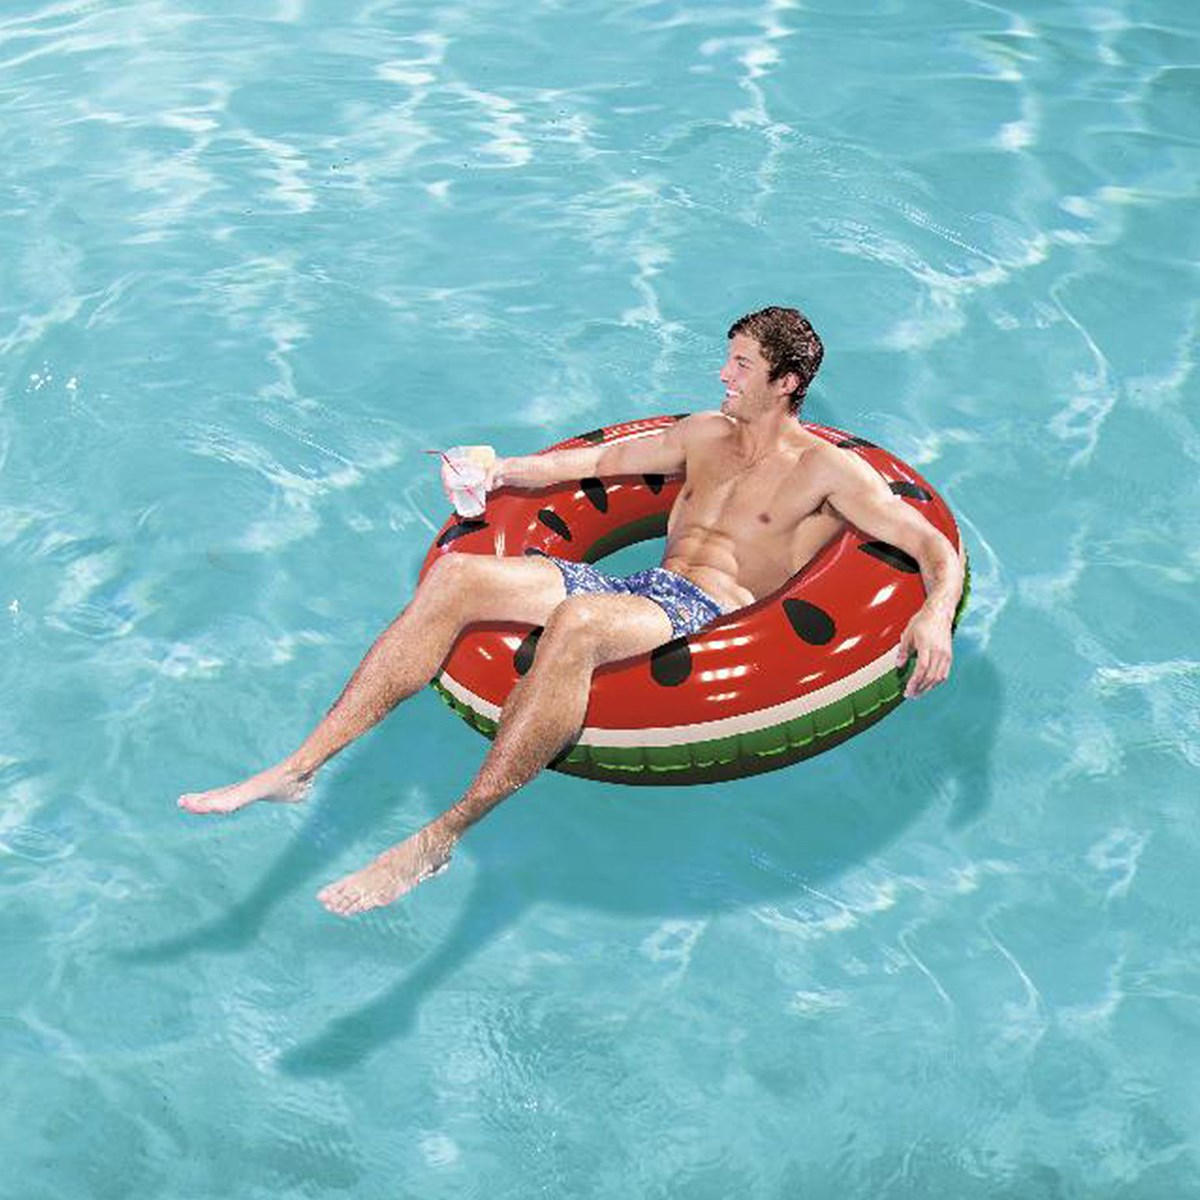 36121 Круг для плавания Фрукты 119 см